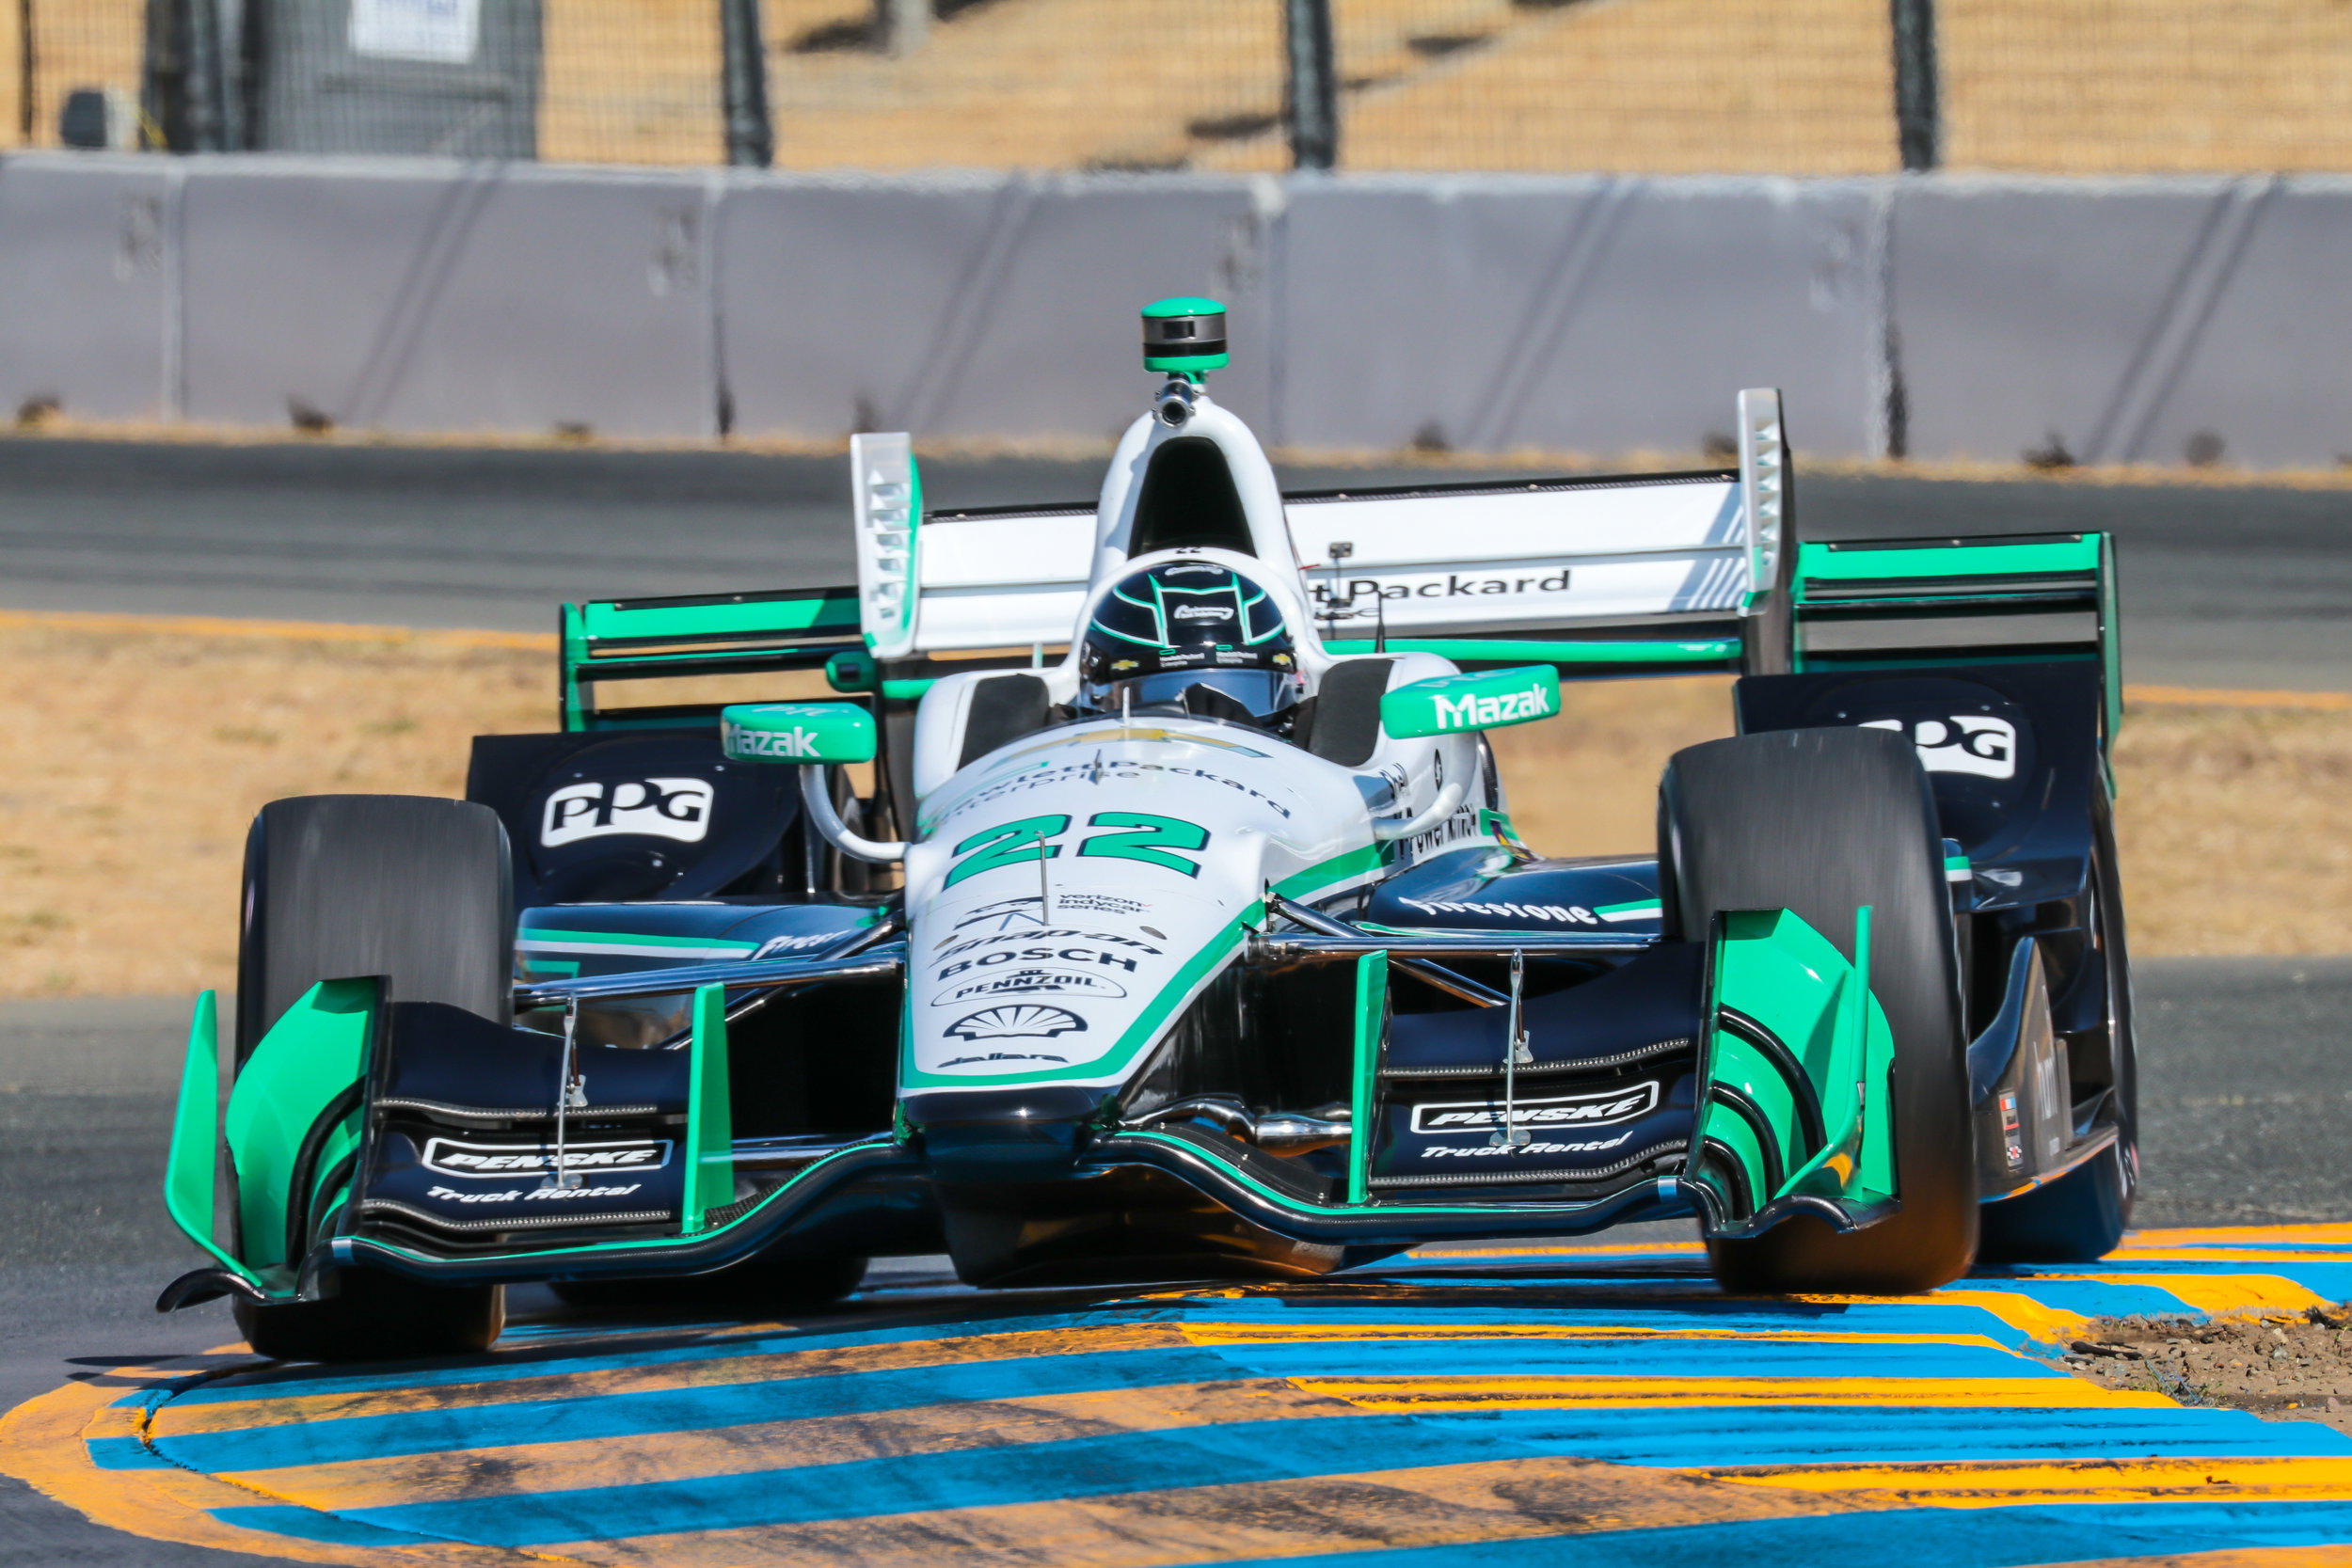 Indy16-2186.jpg